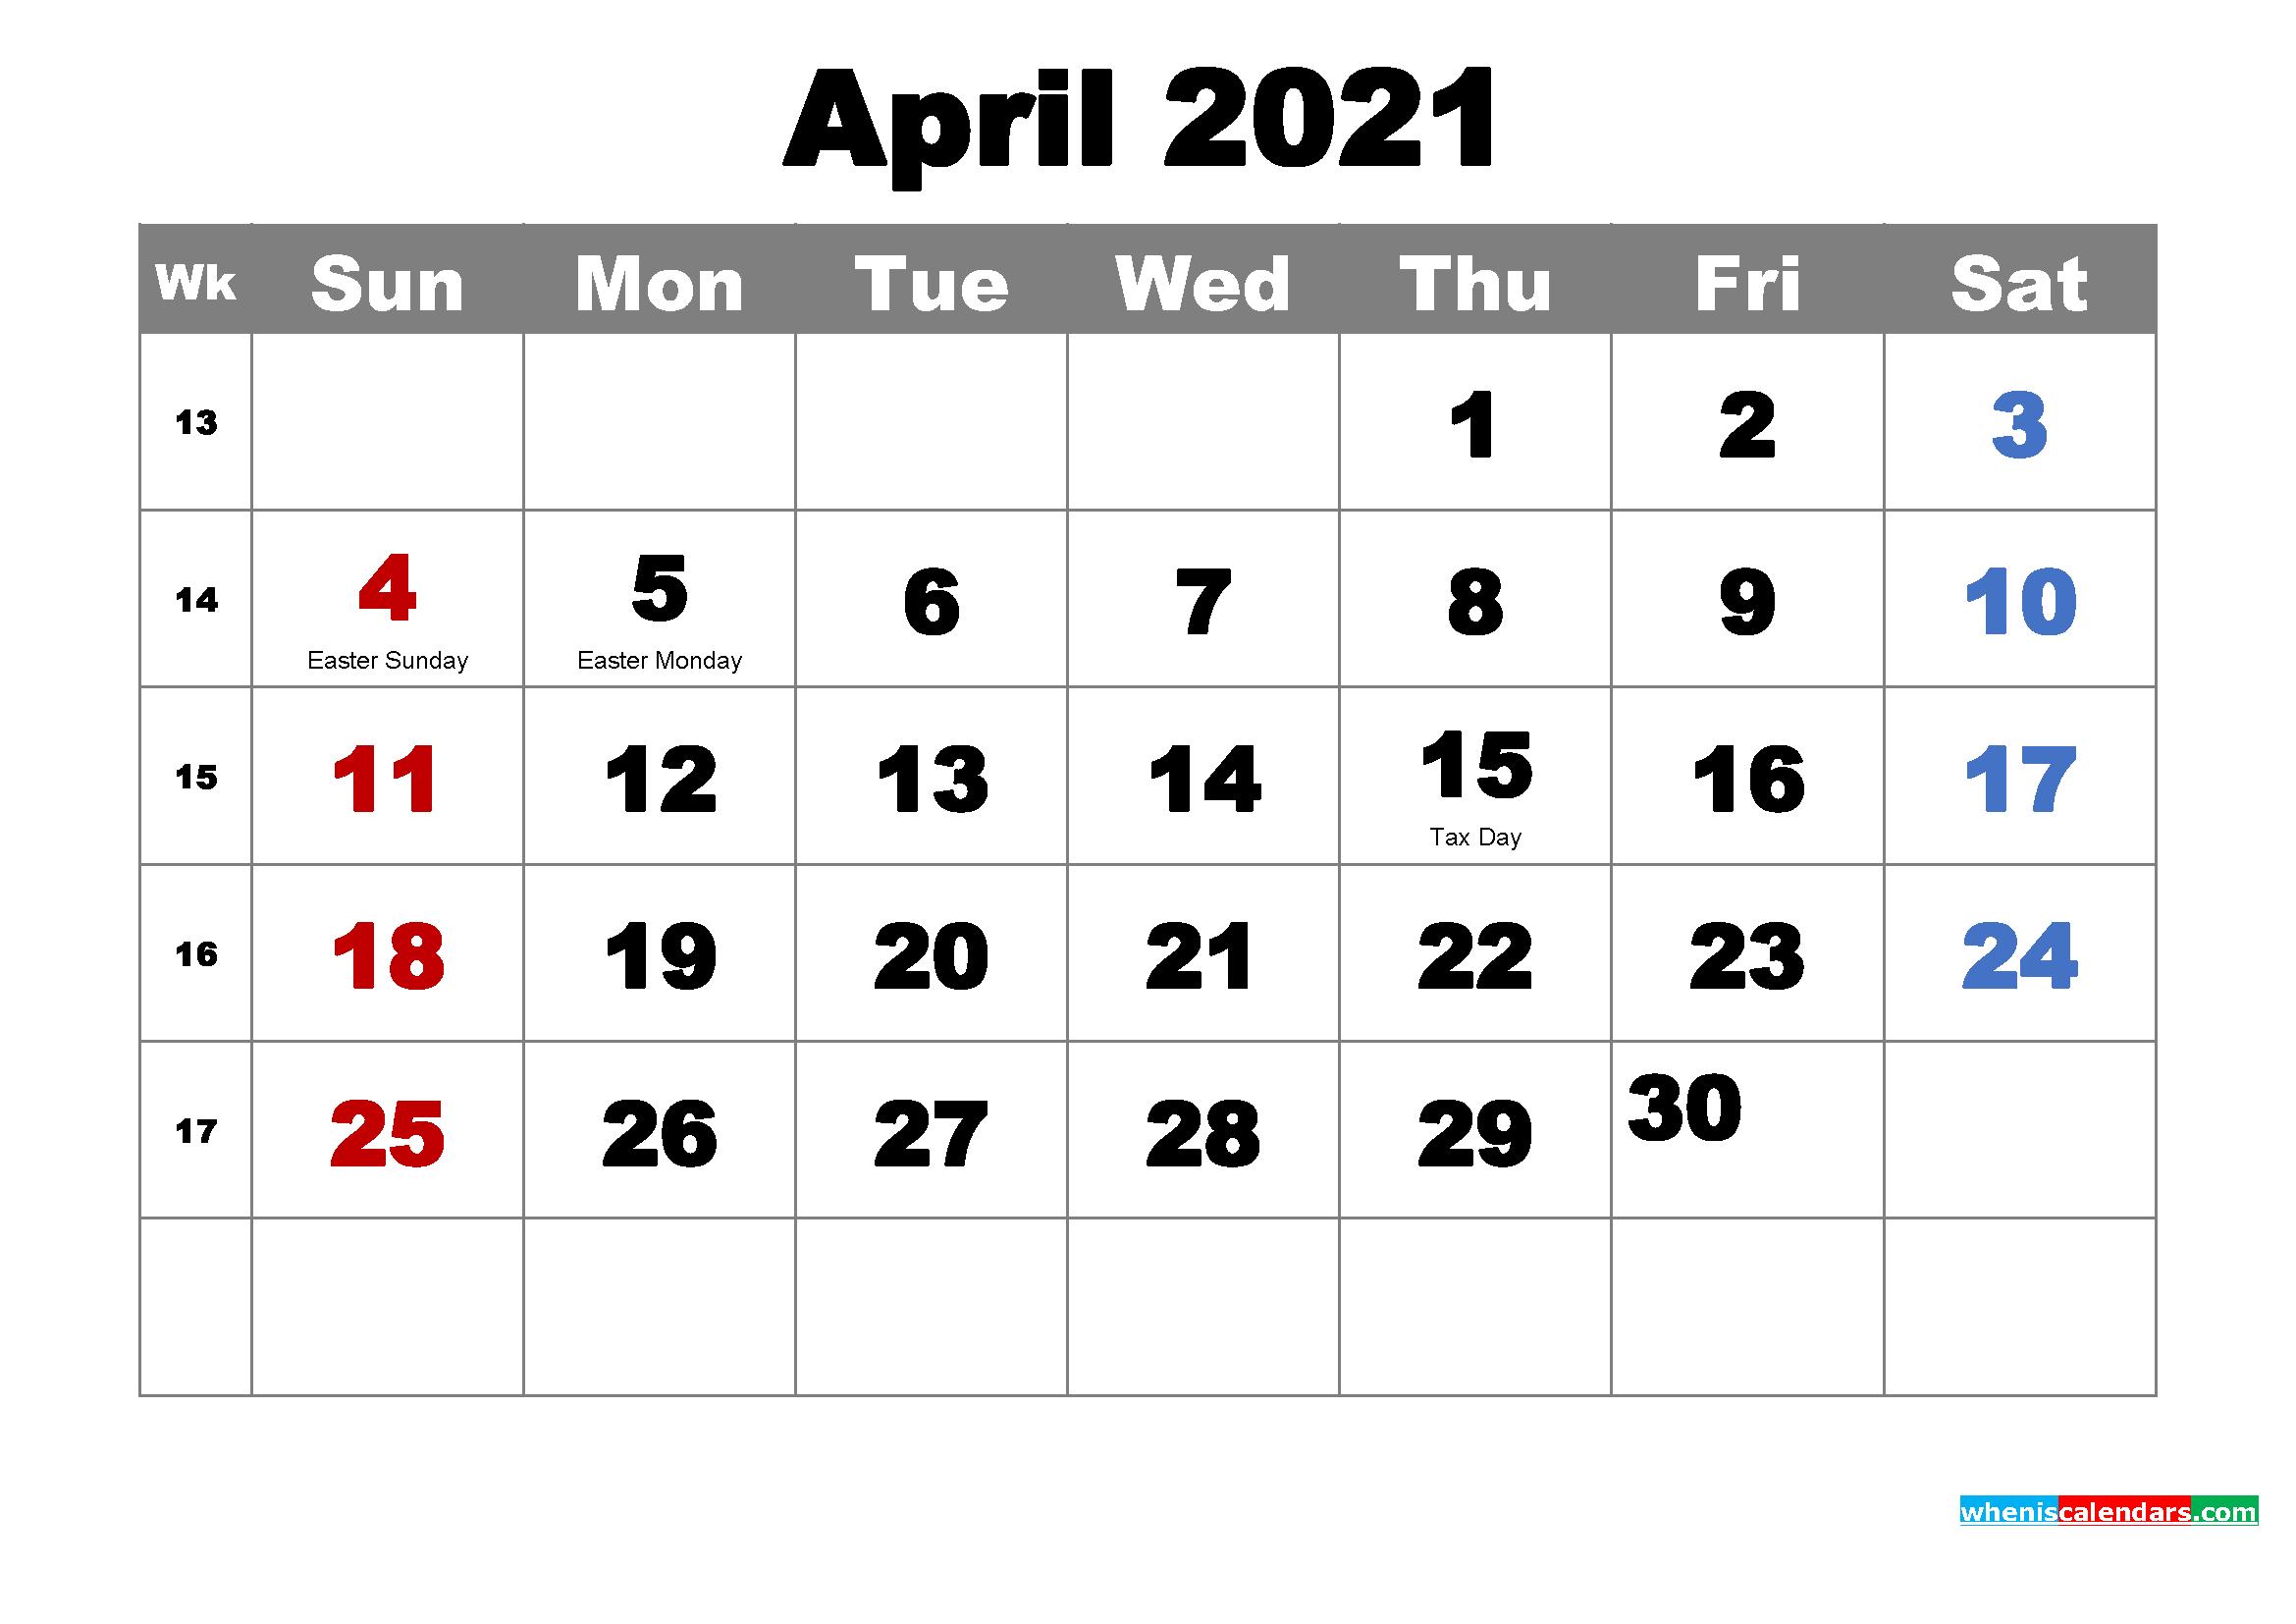 Free Printable April 2021 Calendar Wallpaper | Free ...